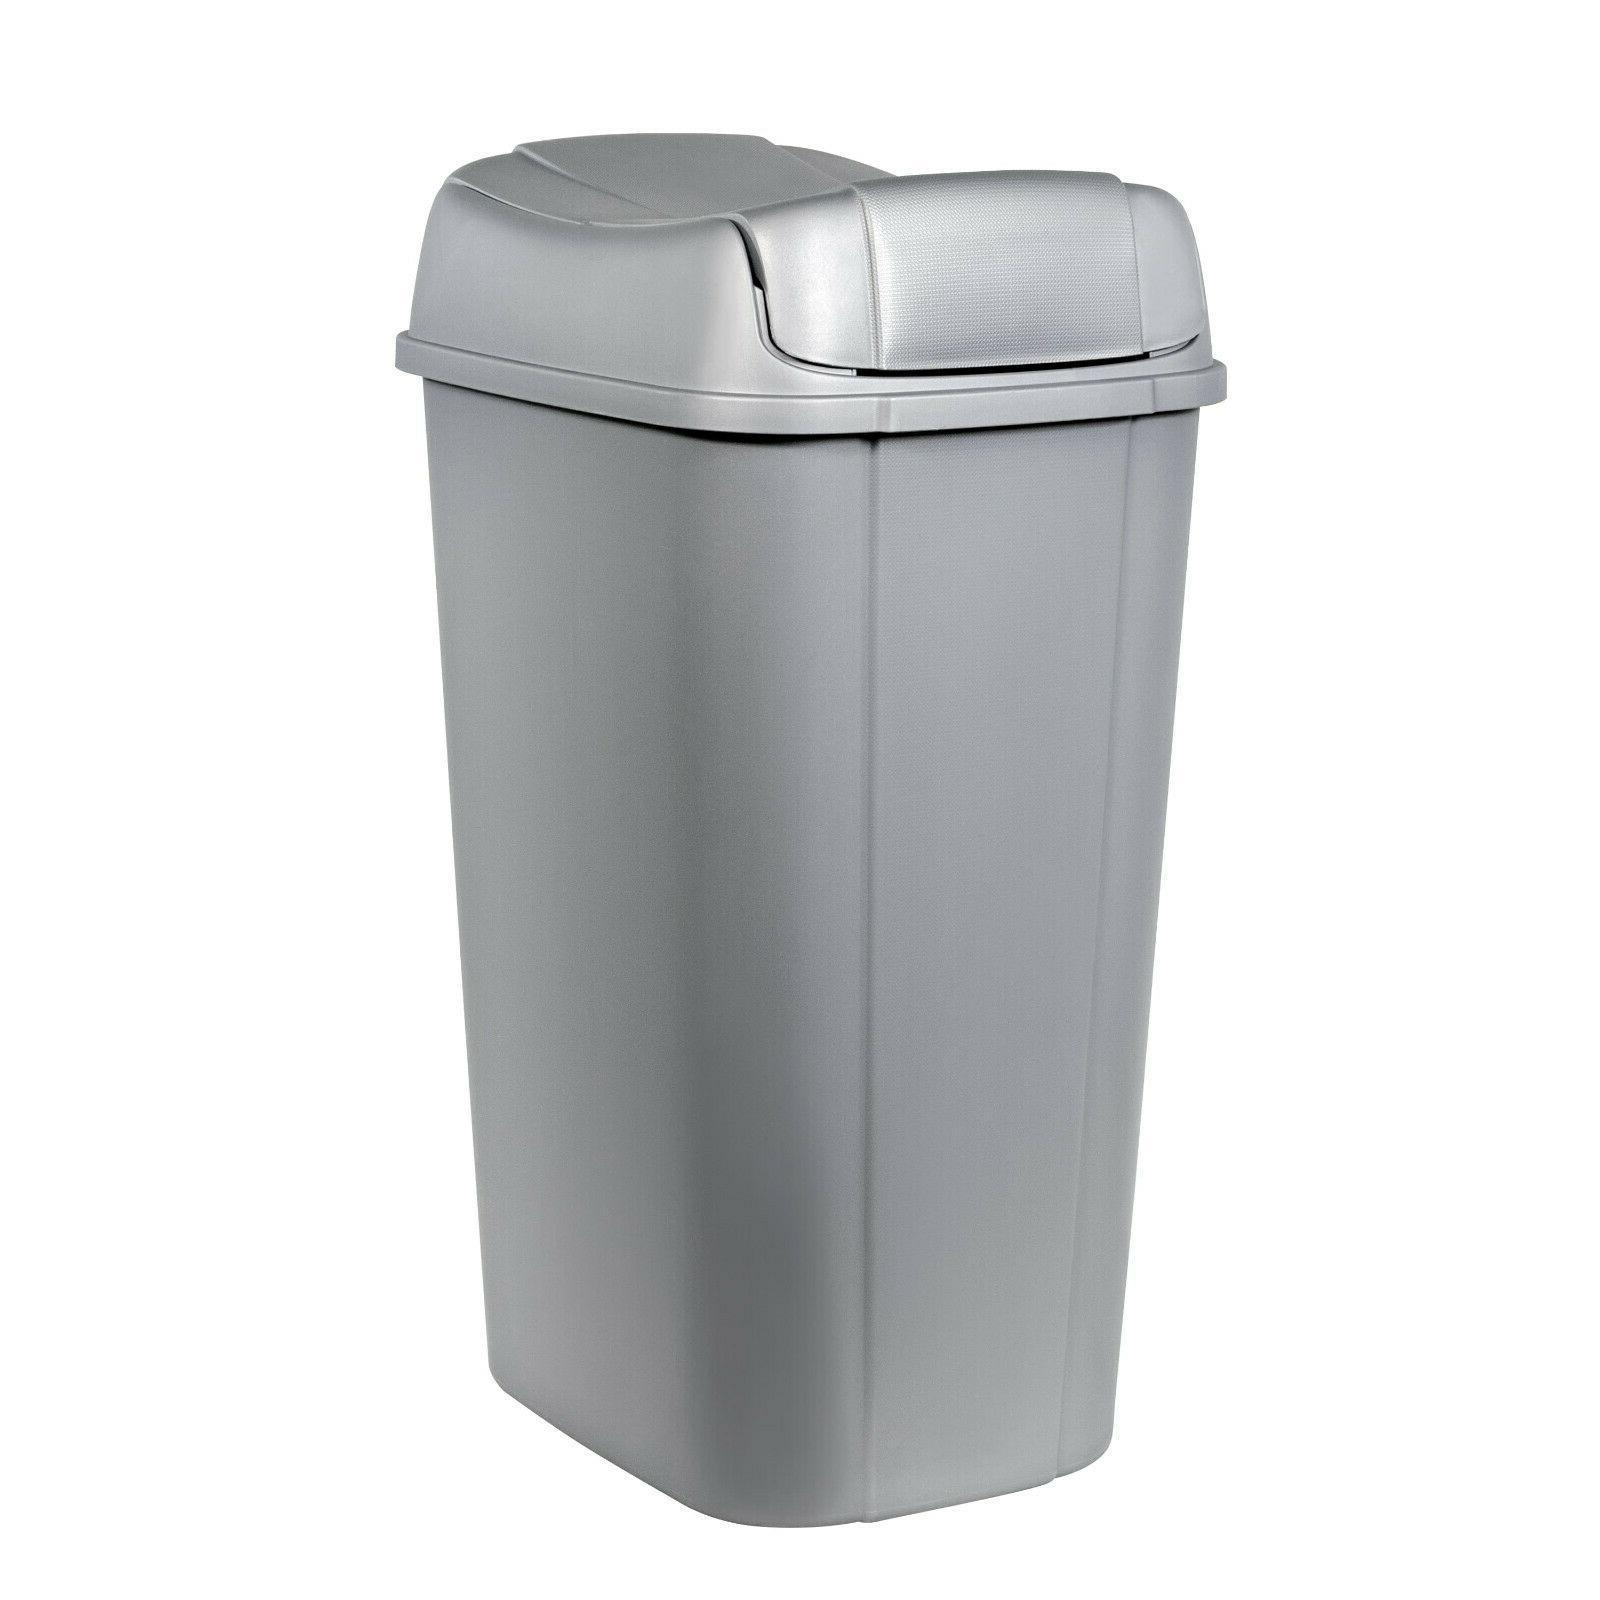 13.3-gallon Hefty Lid Trash Can, Decorative